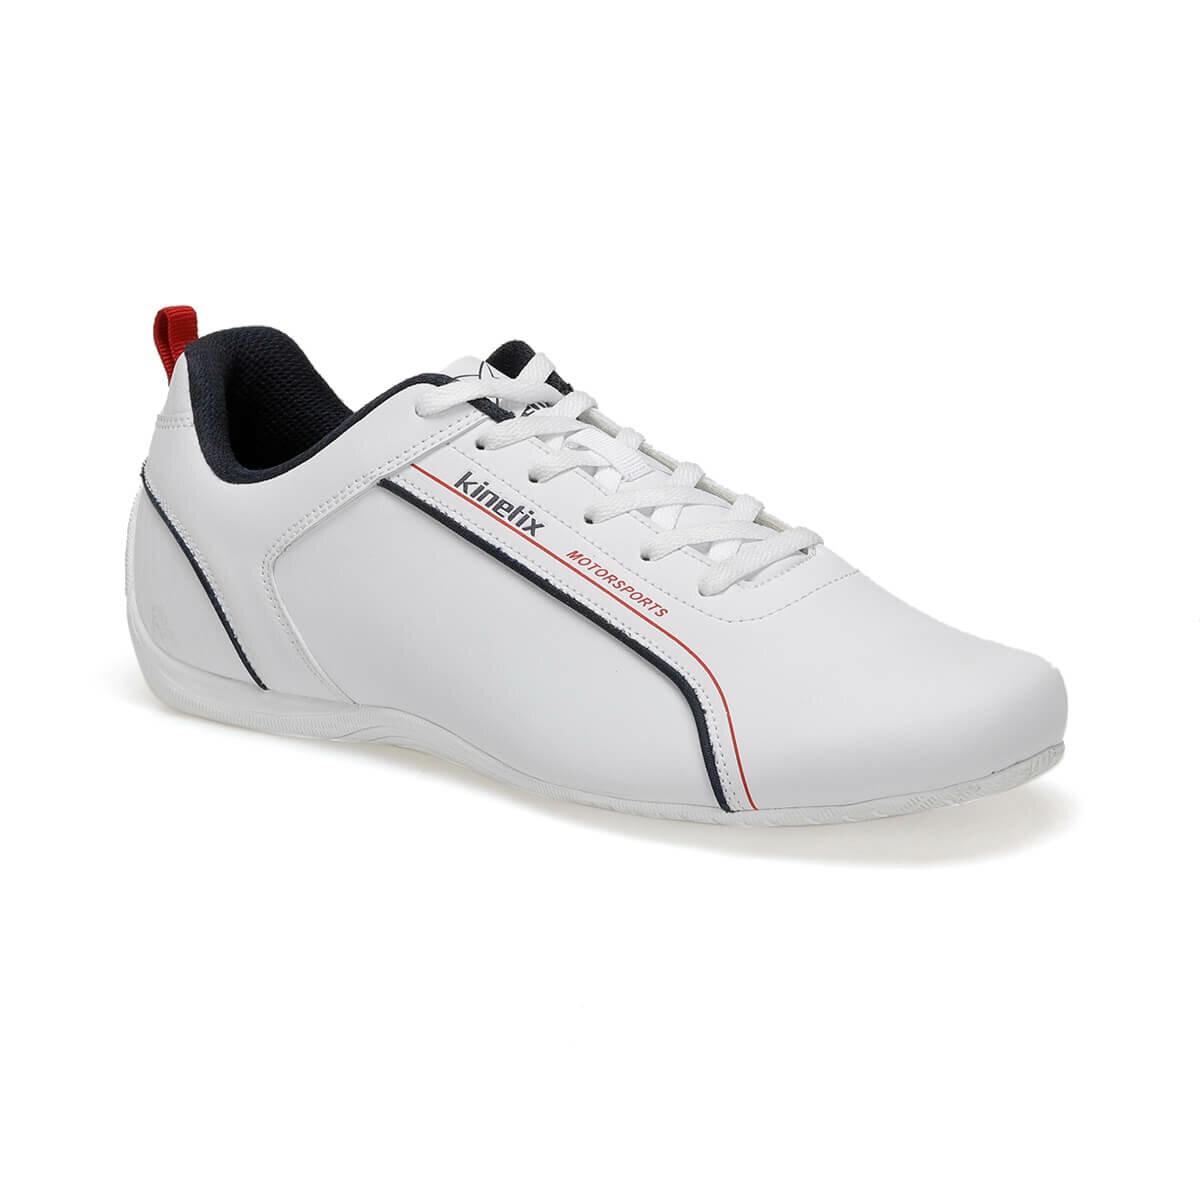 FLO RED M 9PR White Men 'S Sneaker Shoes KINETIX